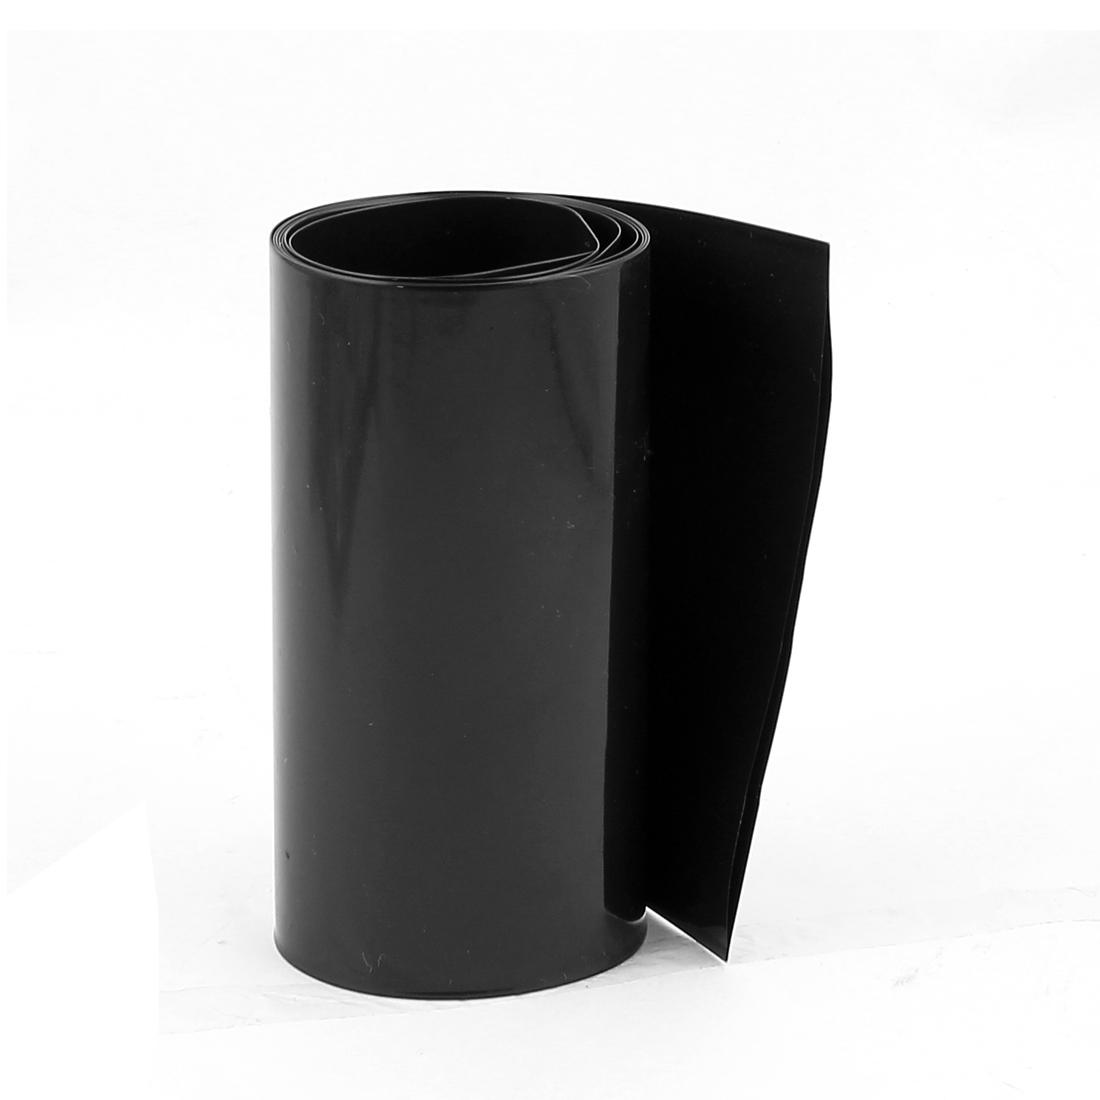 3.3ft 103mm Flat 65mm Dia PVC Heat Shrink Tubing Black for 18650 Battery